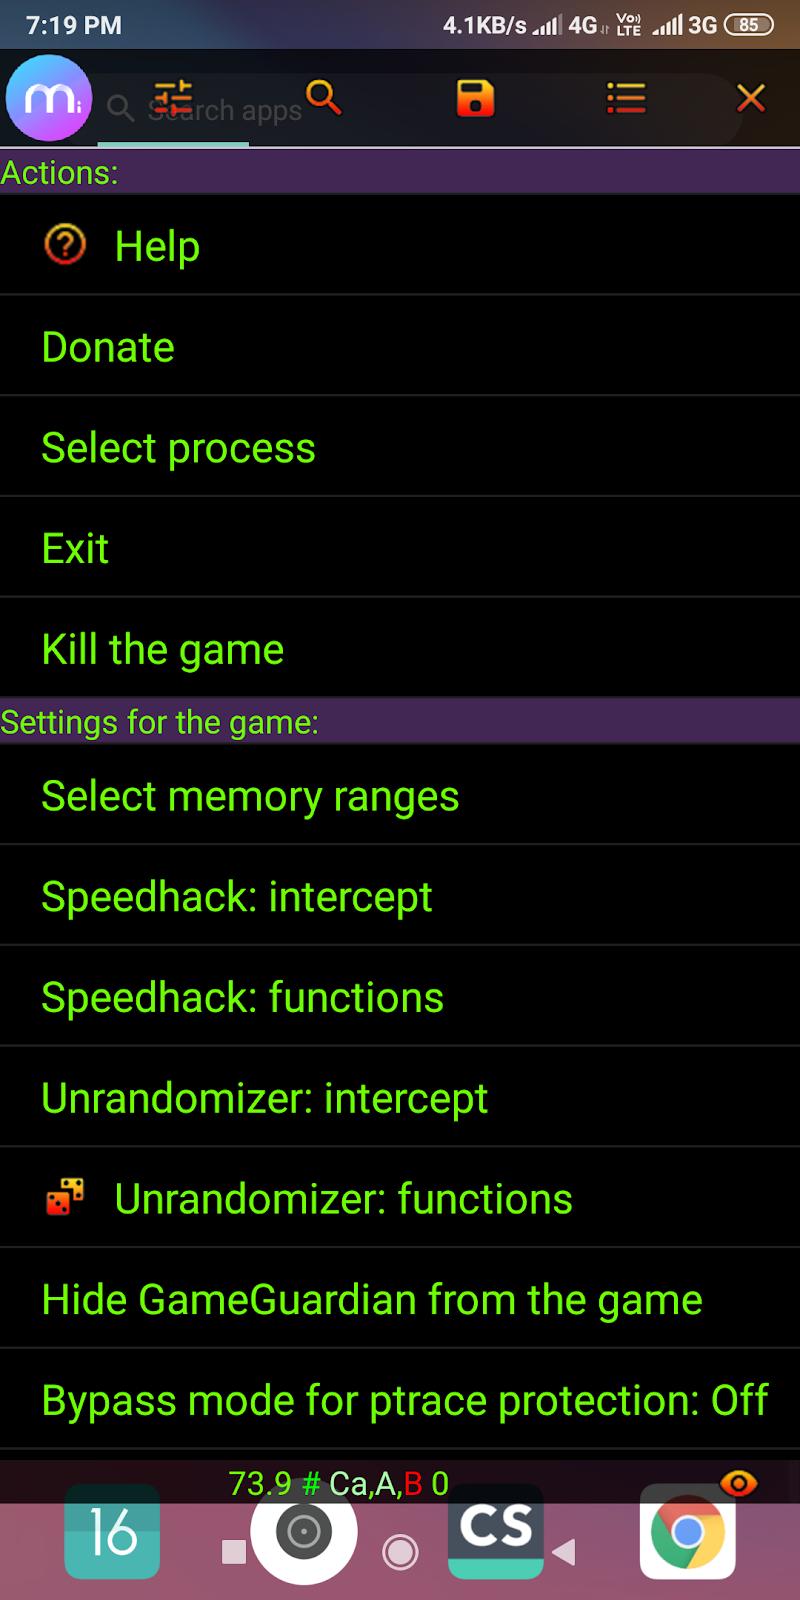 Game Guardian Mod Apk 73 9 (fix crash)- PUBG Mobile Hack